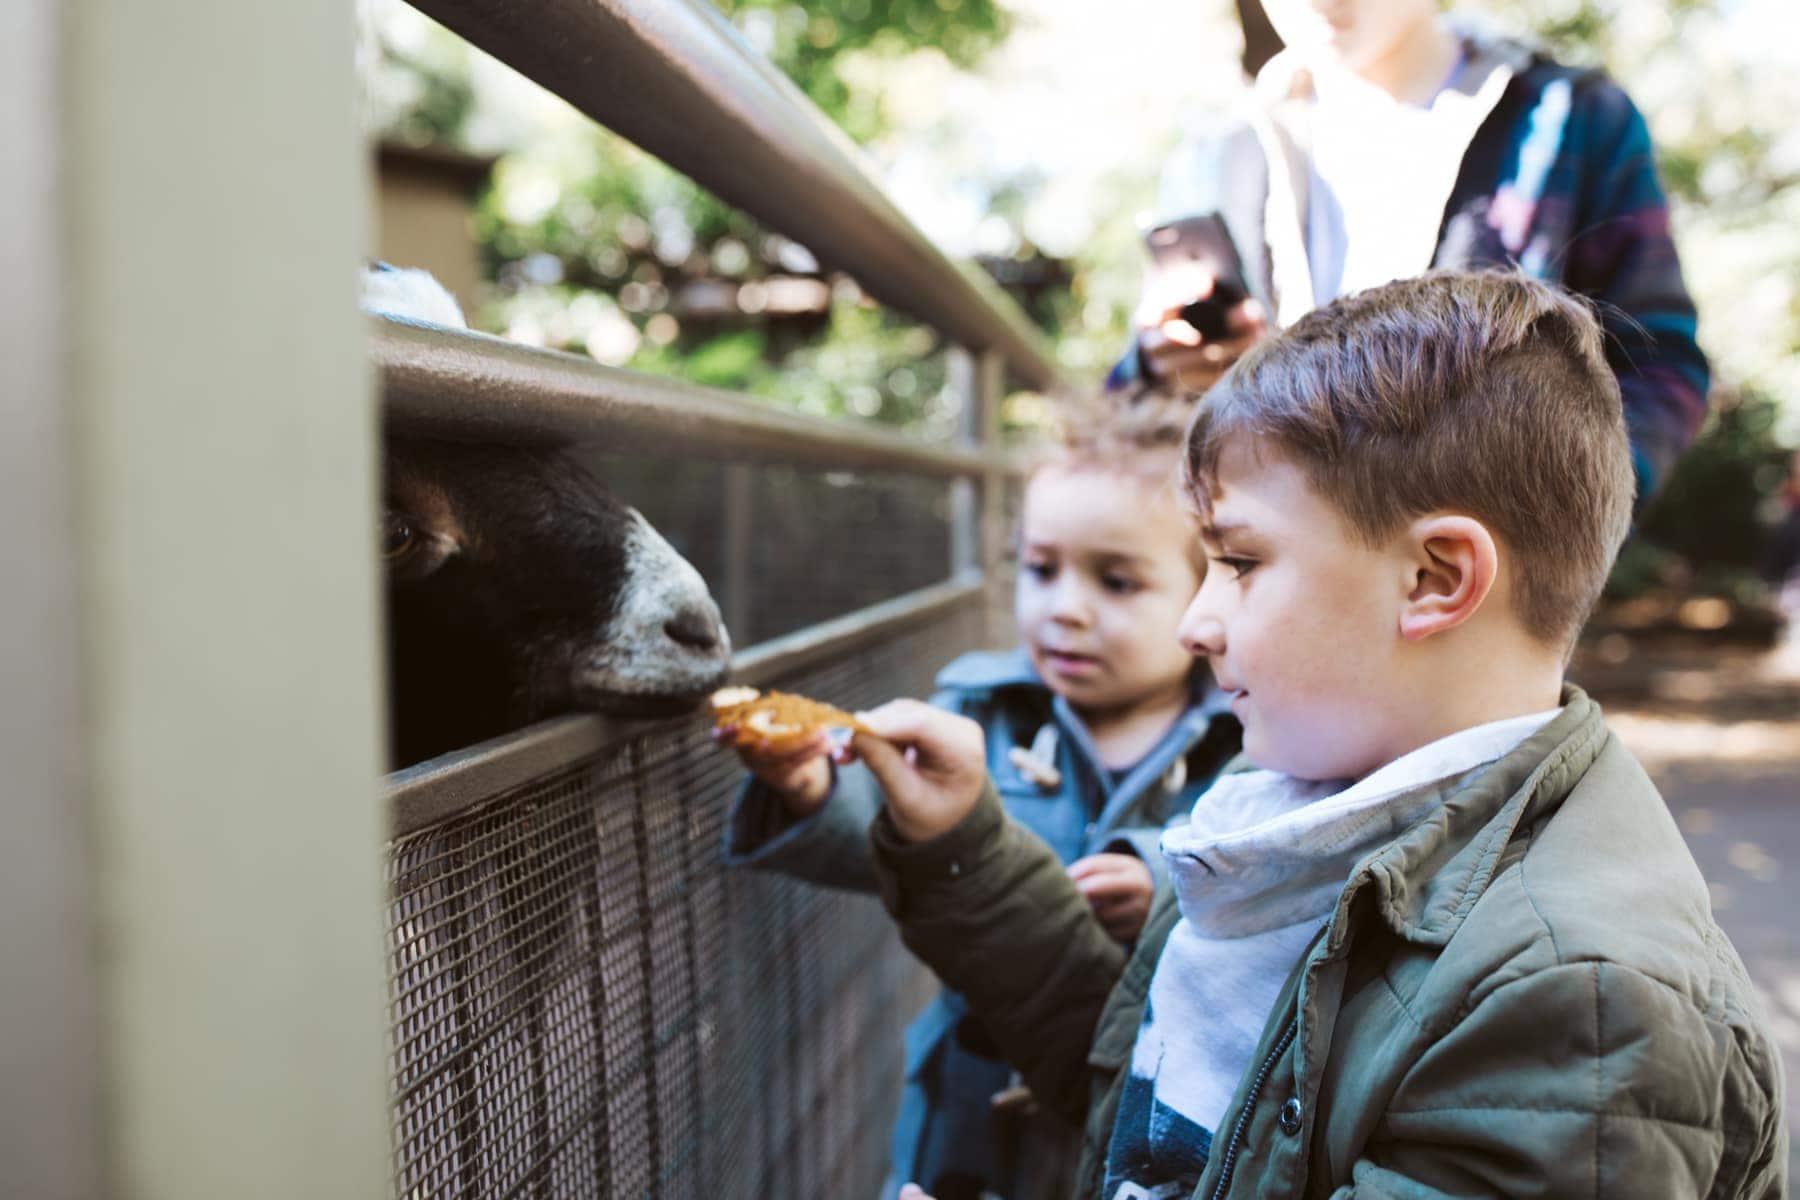 Central Park Zoo Feeding Goats